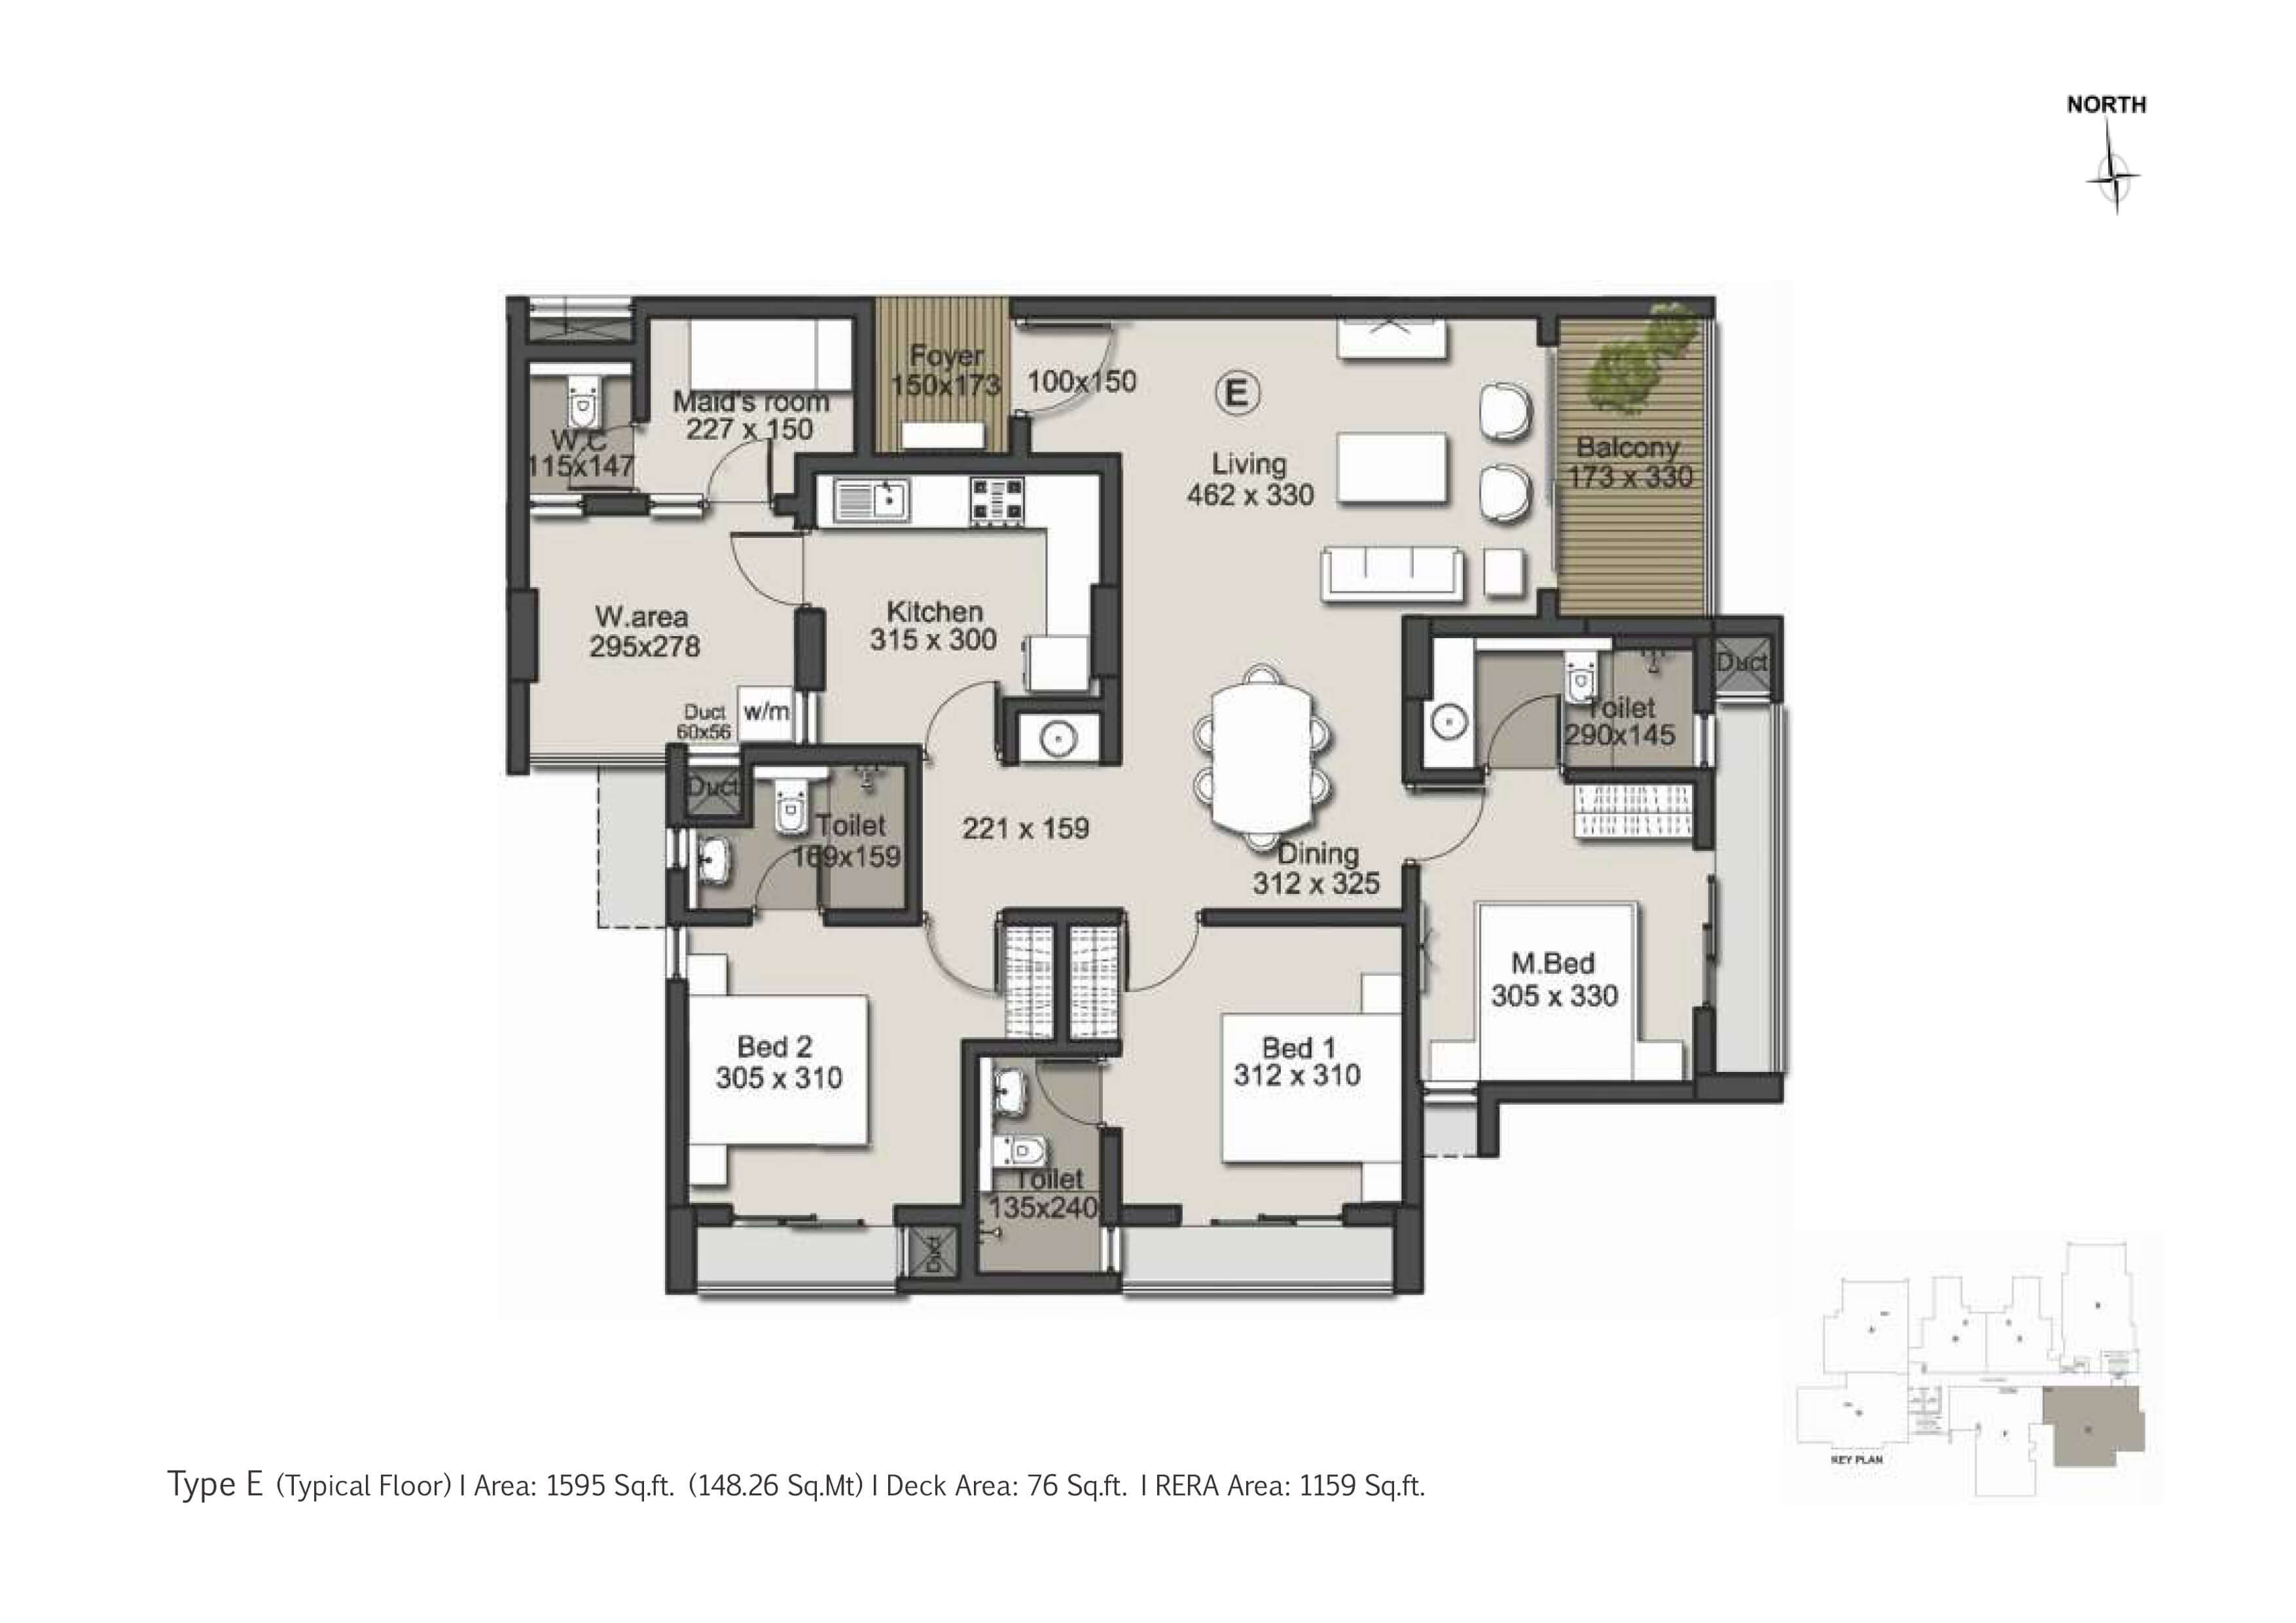 Type E Floor Plan